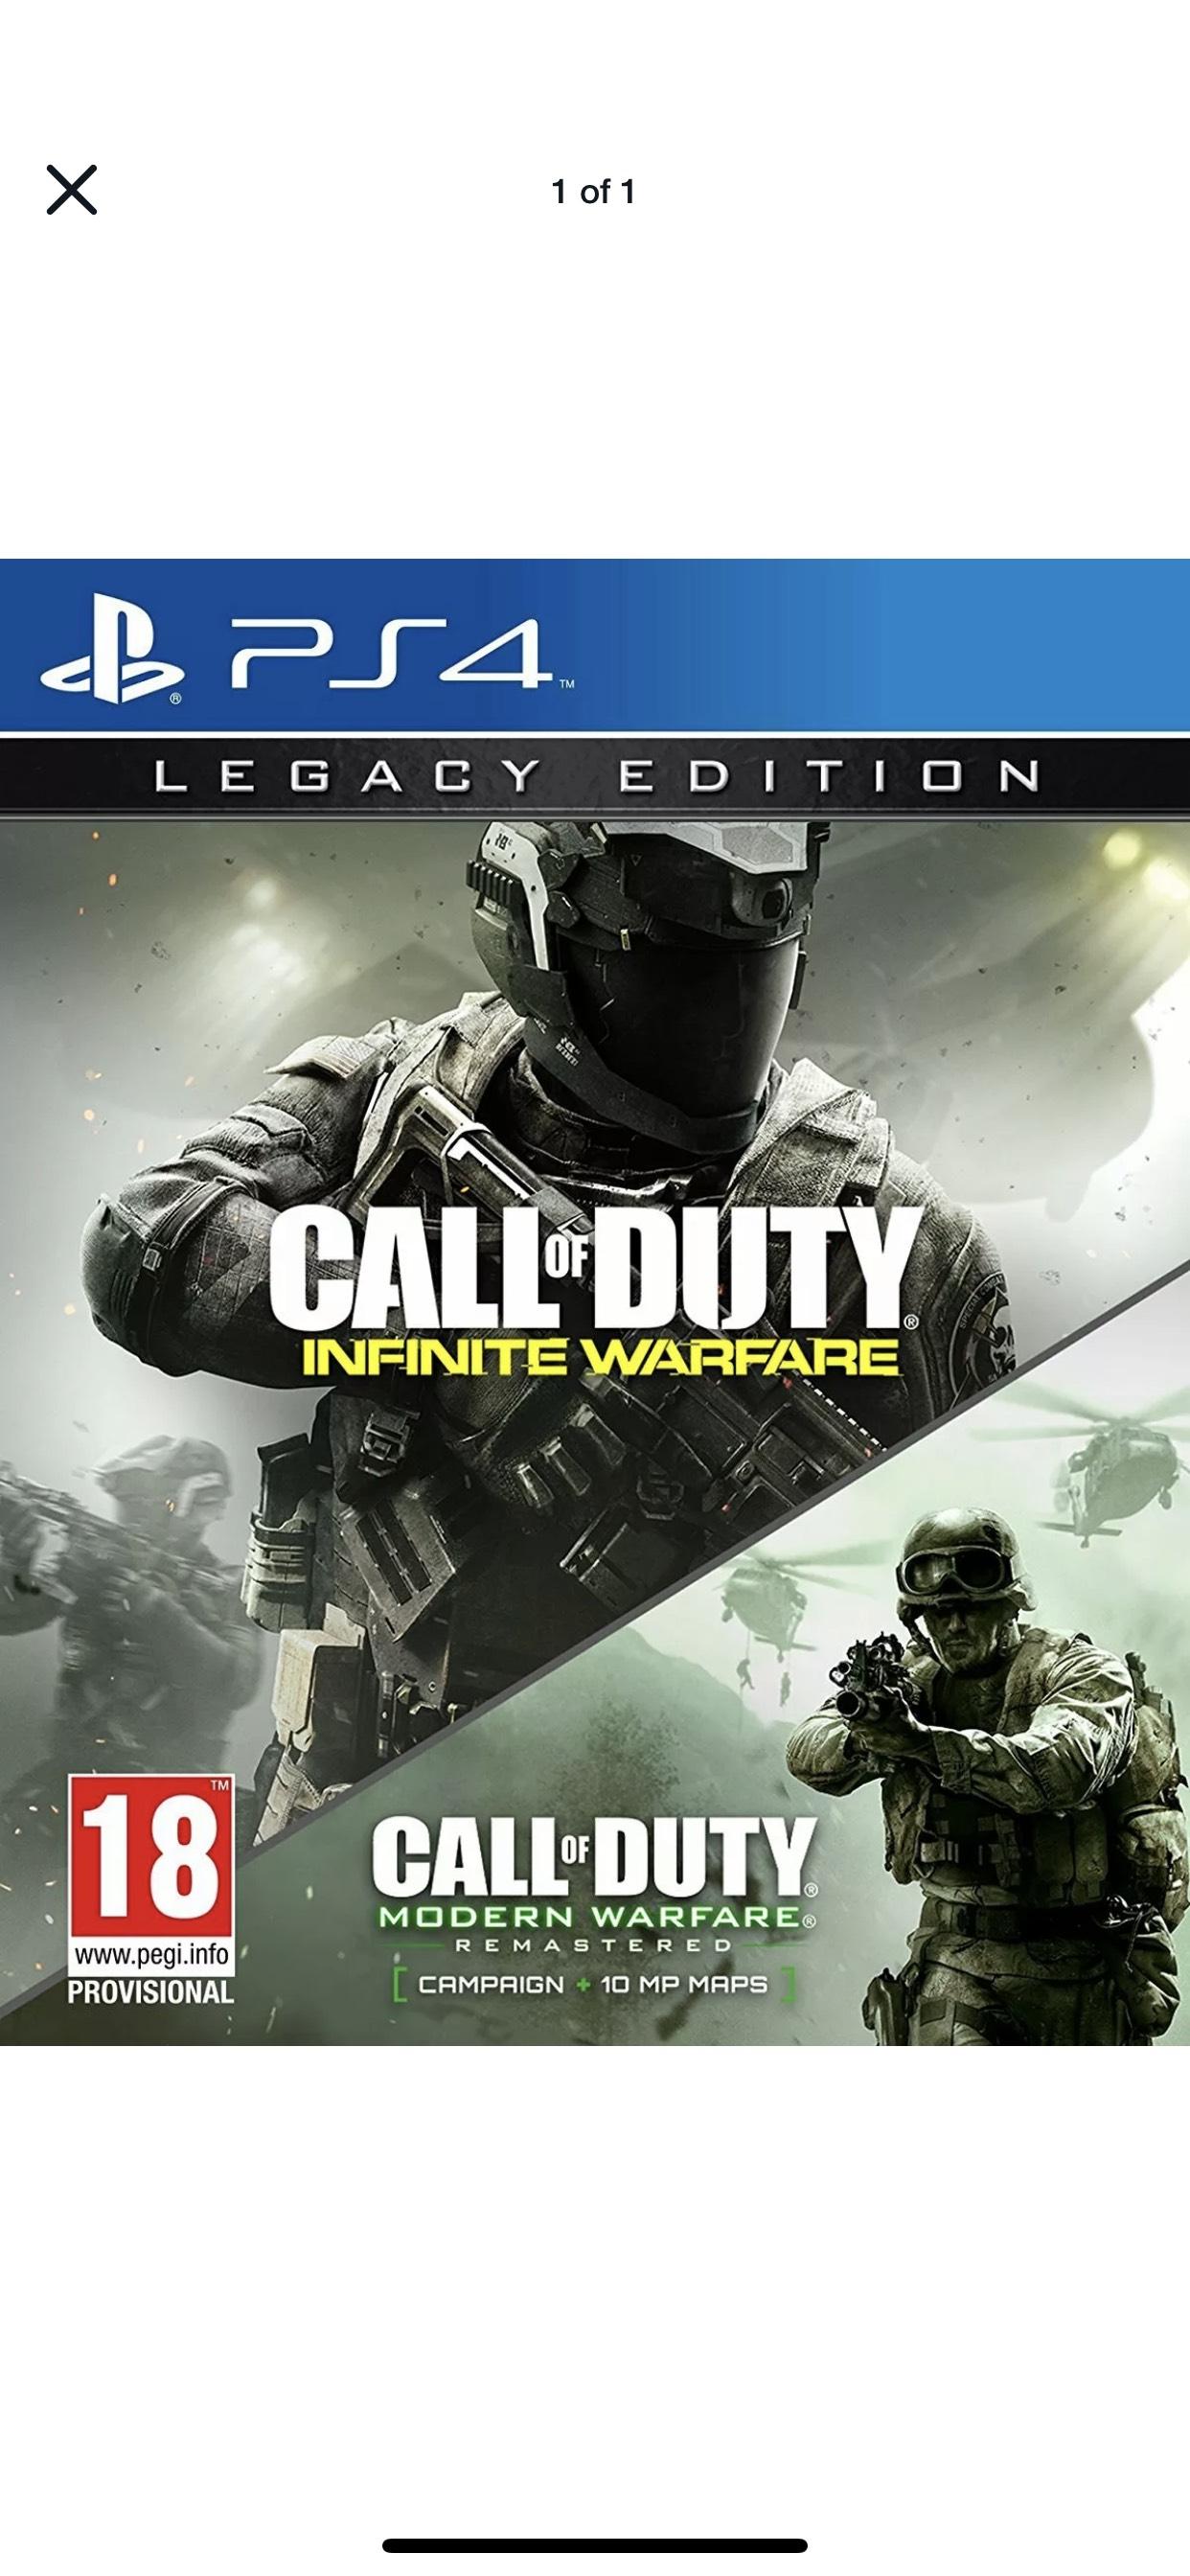 Call of Duty Infinite Warfare - Legacy Edition | PlayStation 4 PS4 New - £7.99 @ eBay / itemdr